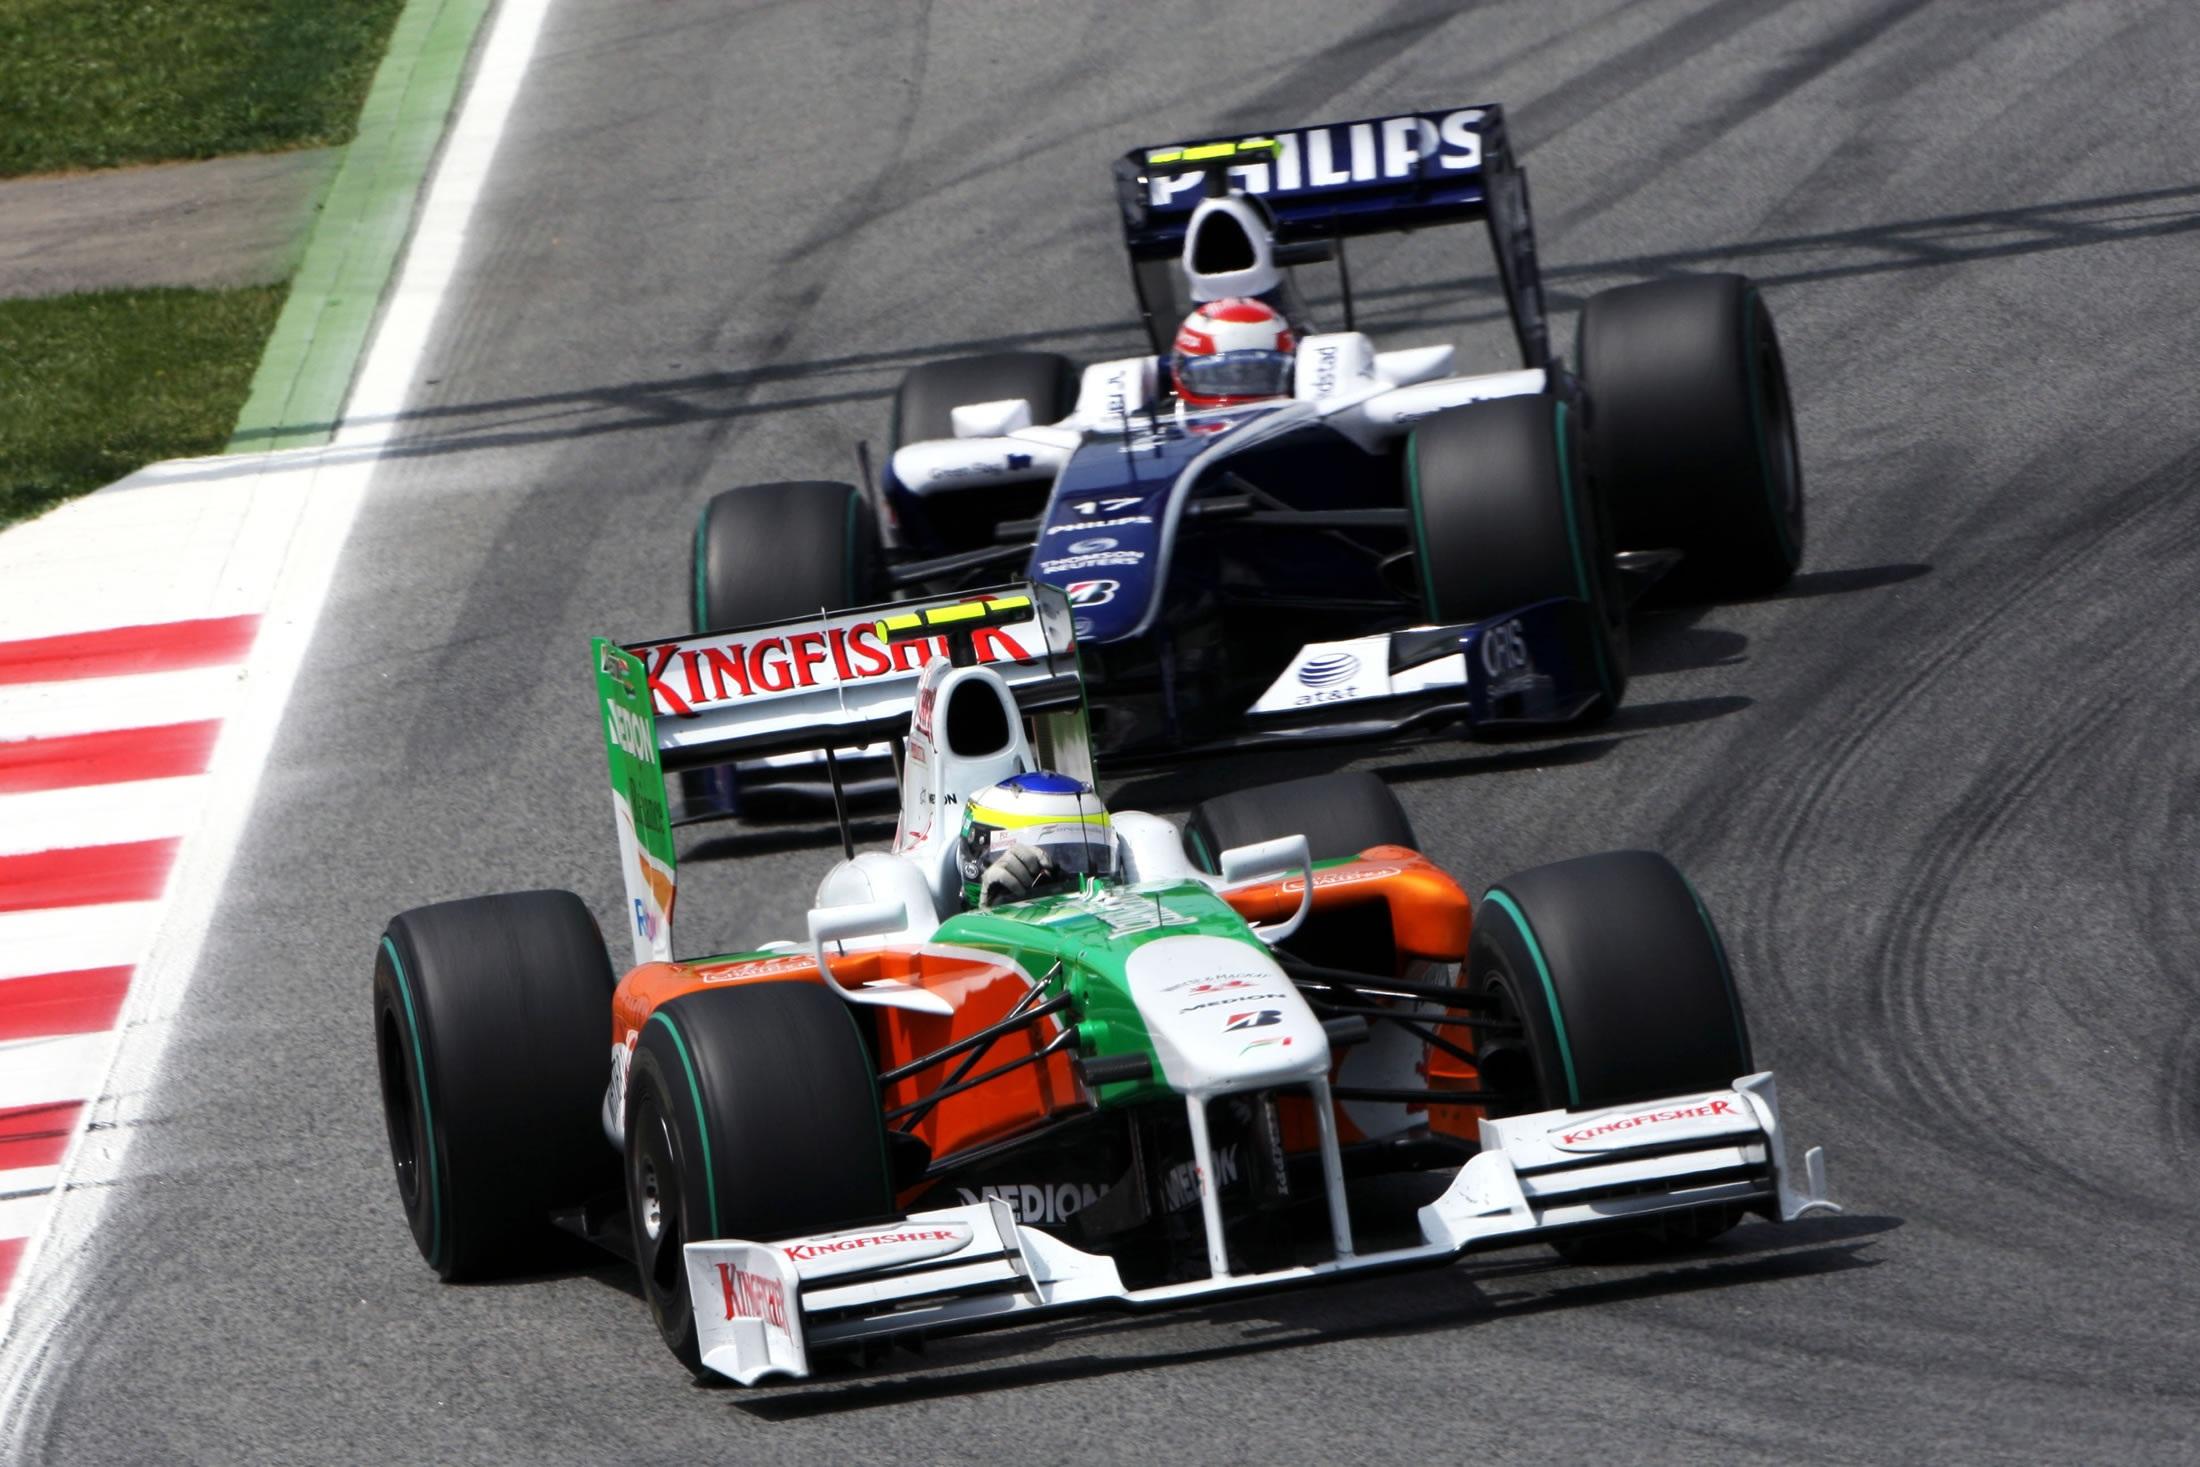 Free Images : sport, vehicle, sports car, race car, race ...